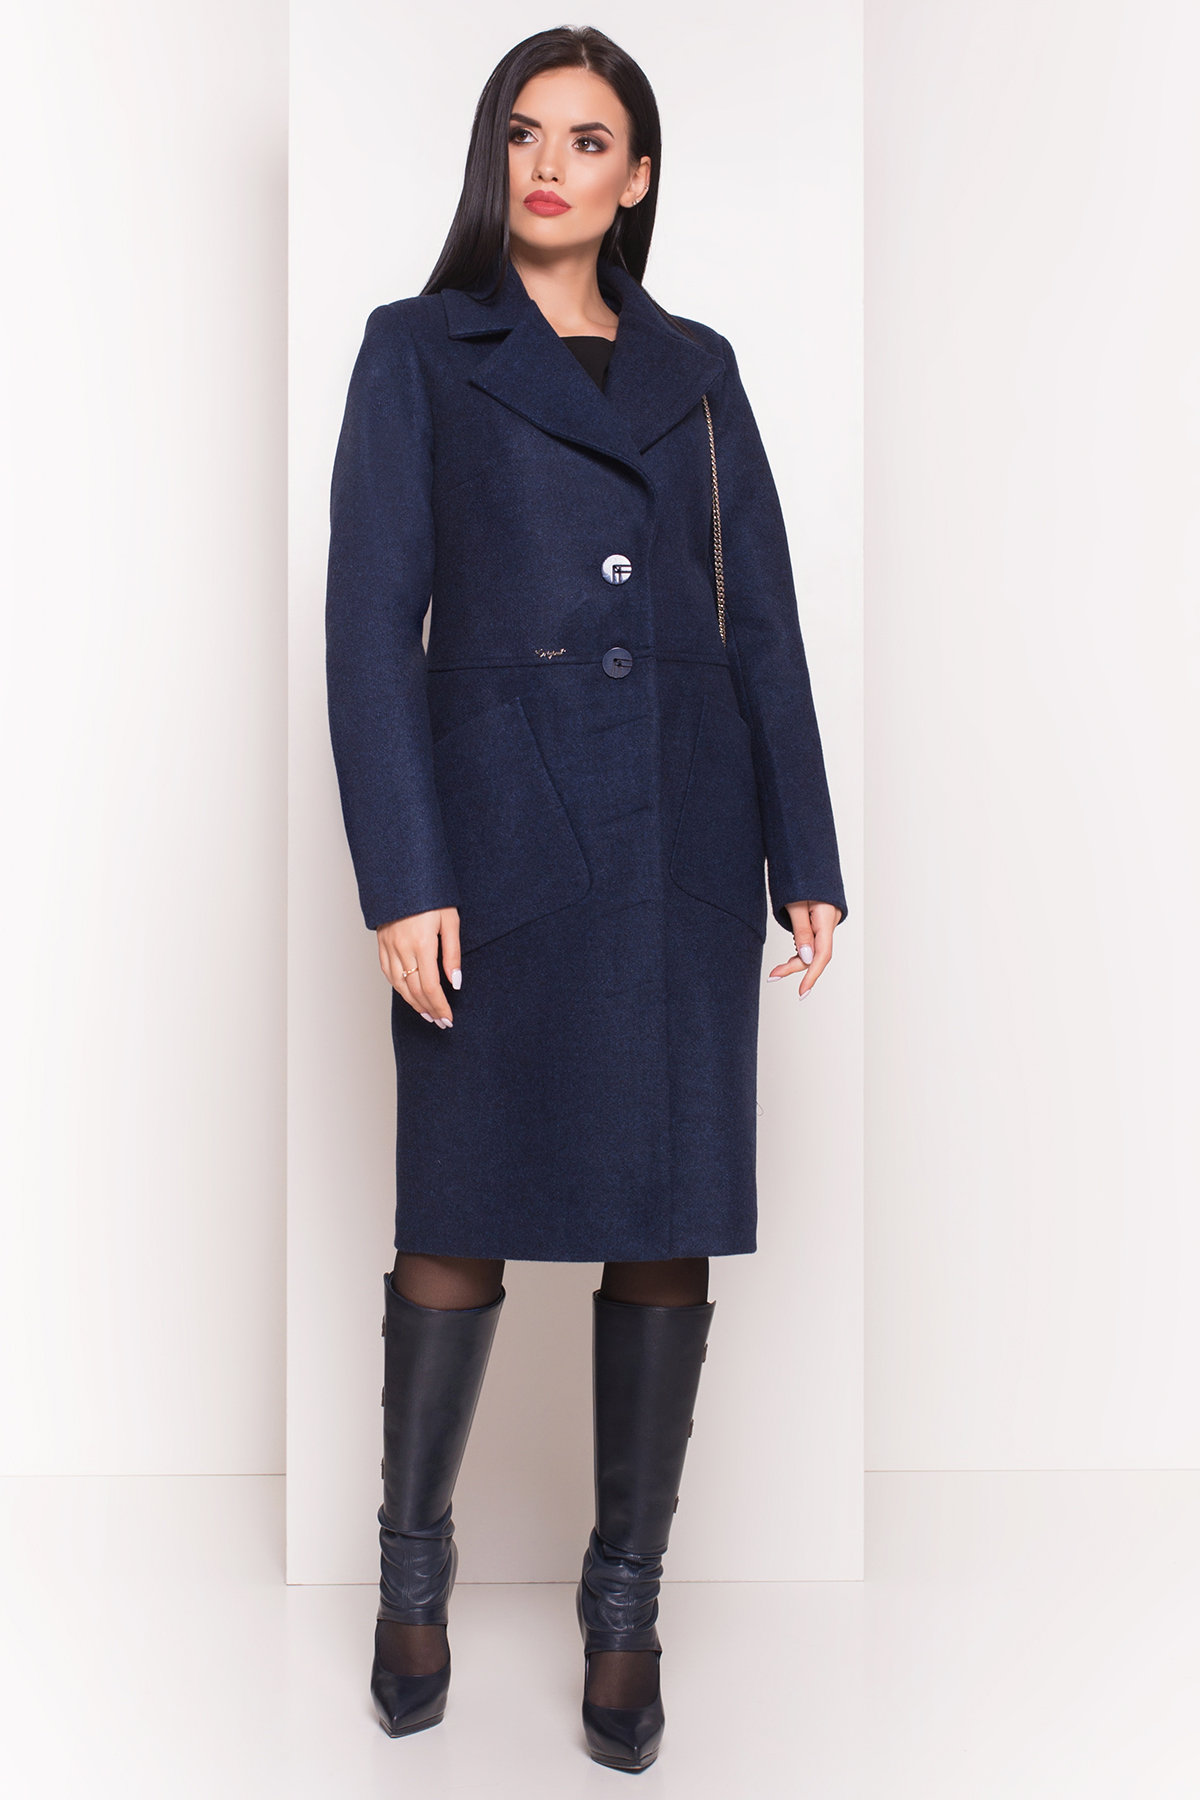 Пальто на весну-осень Габриэлла 4459 АРТ. 36662 Цвет: Темно-синий 17 - фото 4, интернет магазин tm-modus.ru